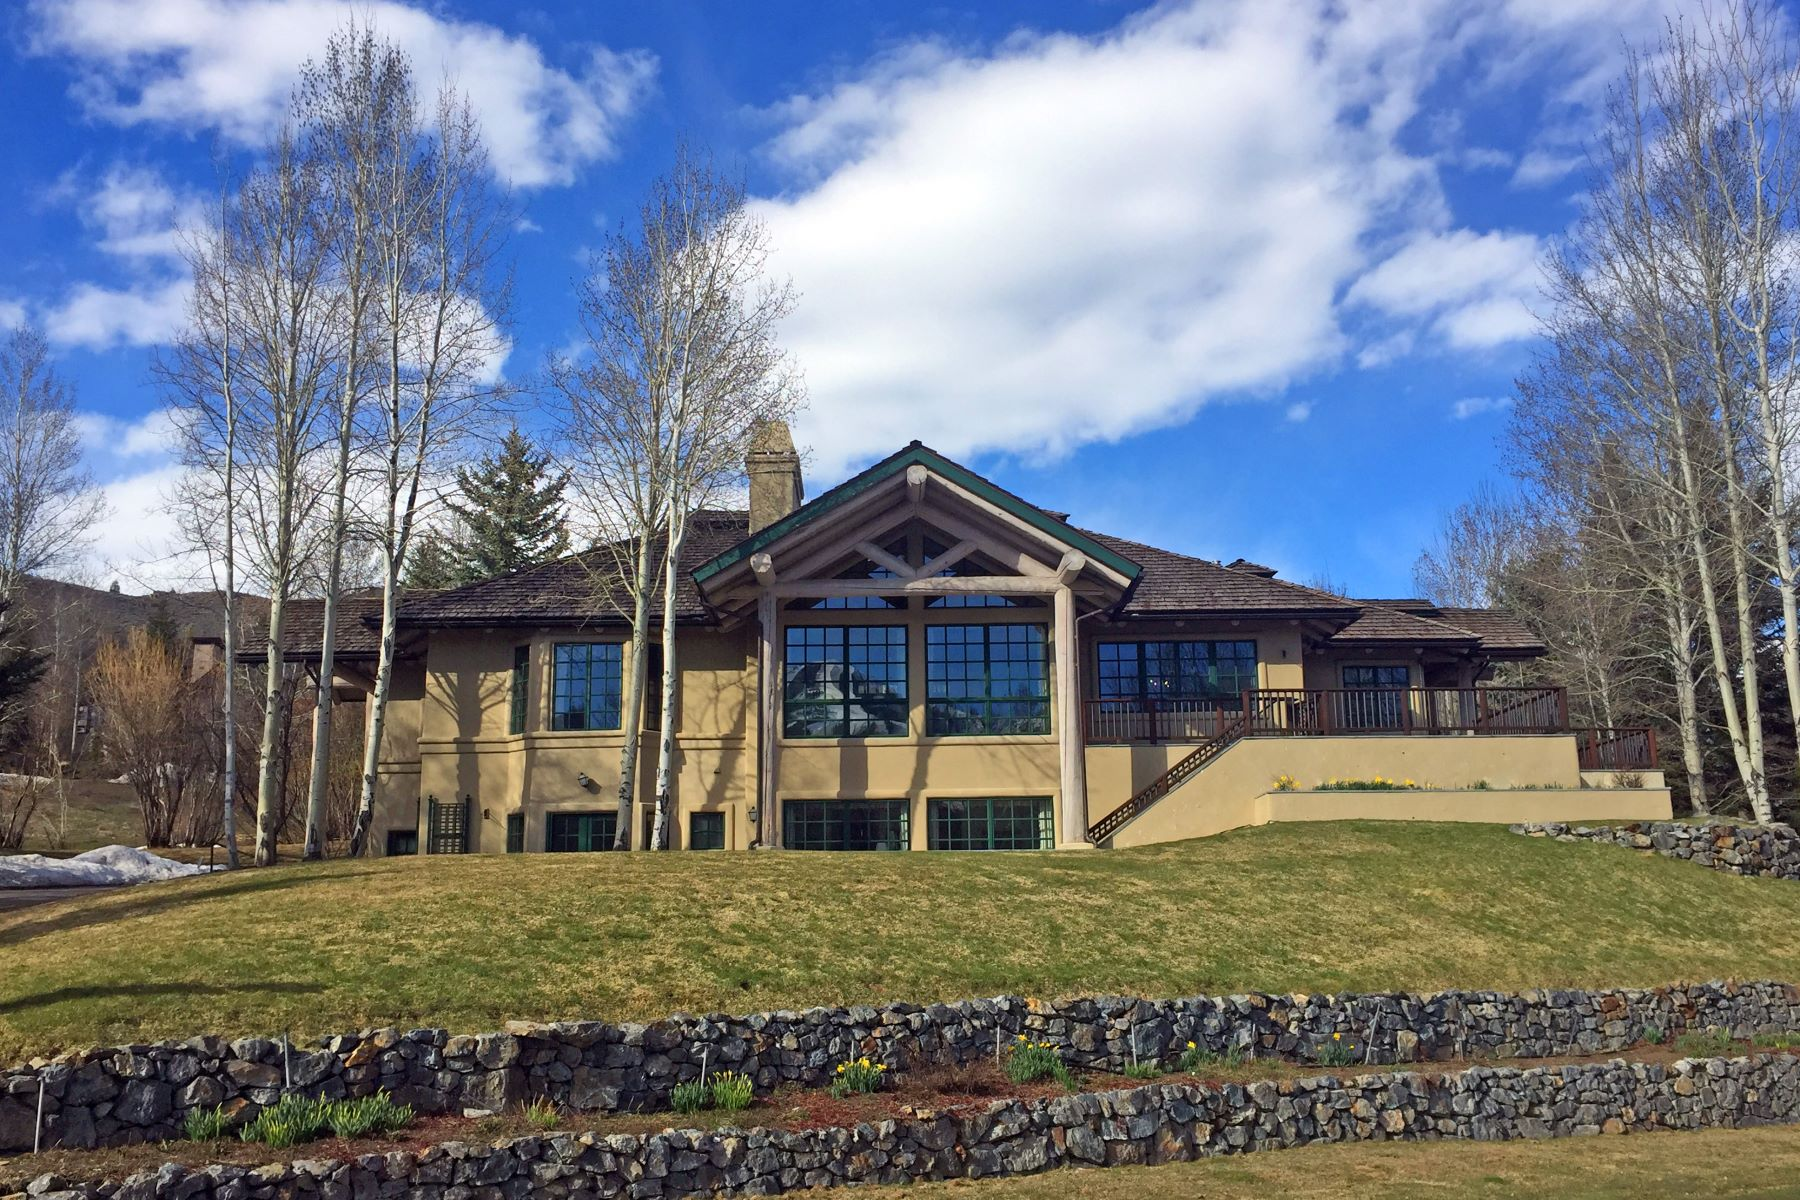 Single Family Home for Sale at Bigwood Views 335 N. Bigwood Dr Ketchum, Idaho, 83340 United States